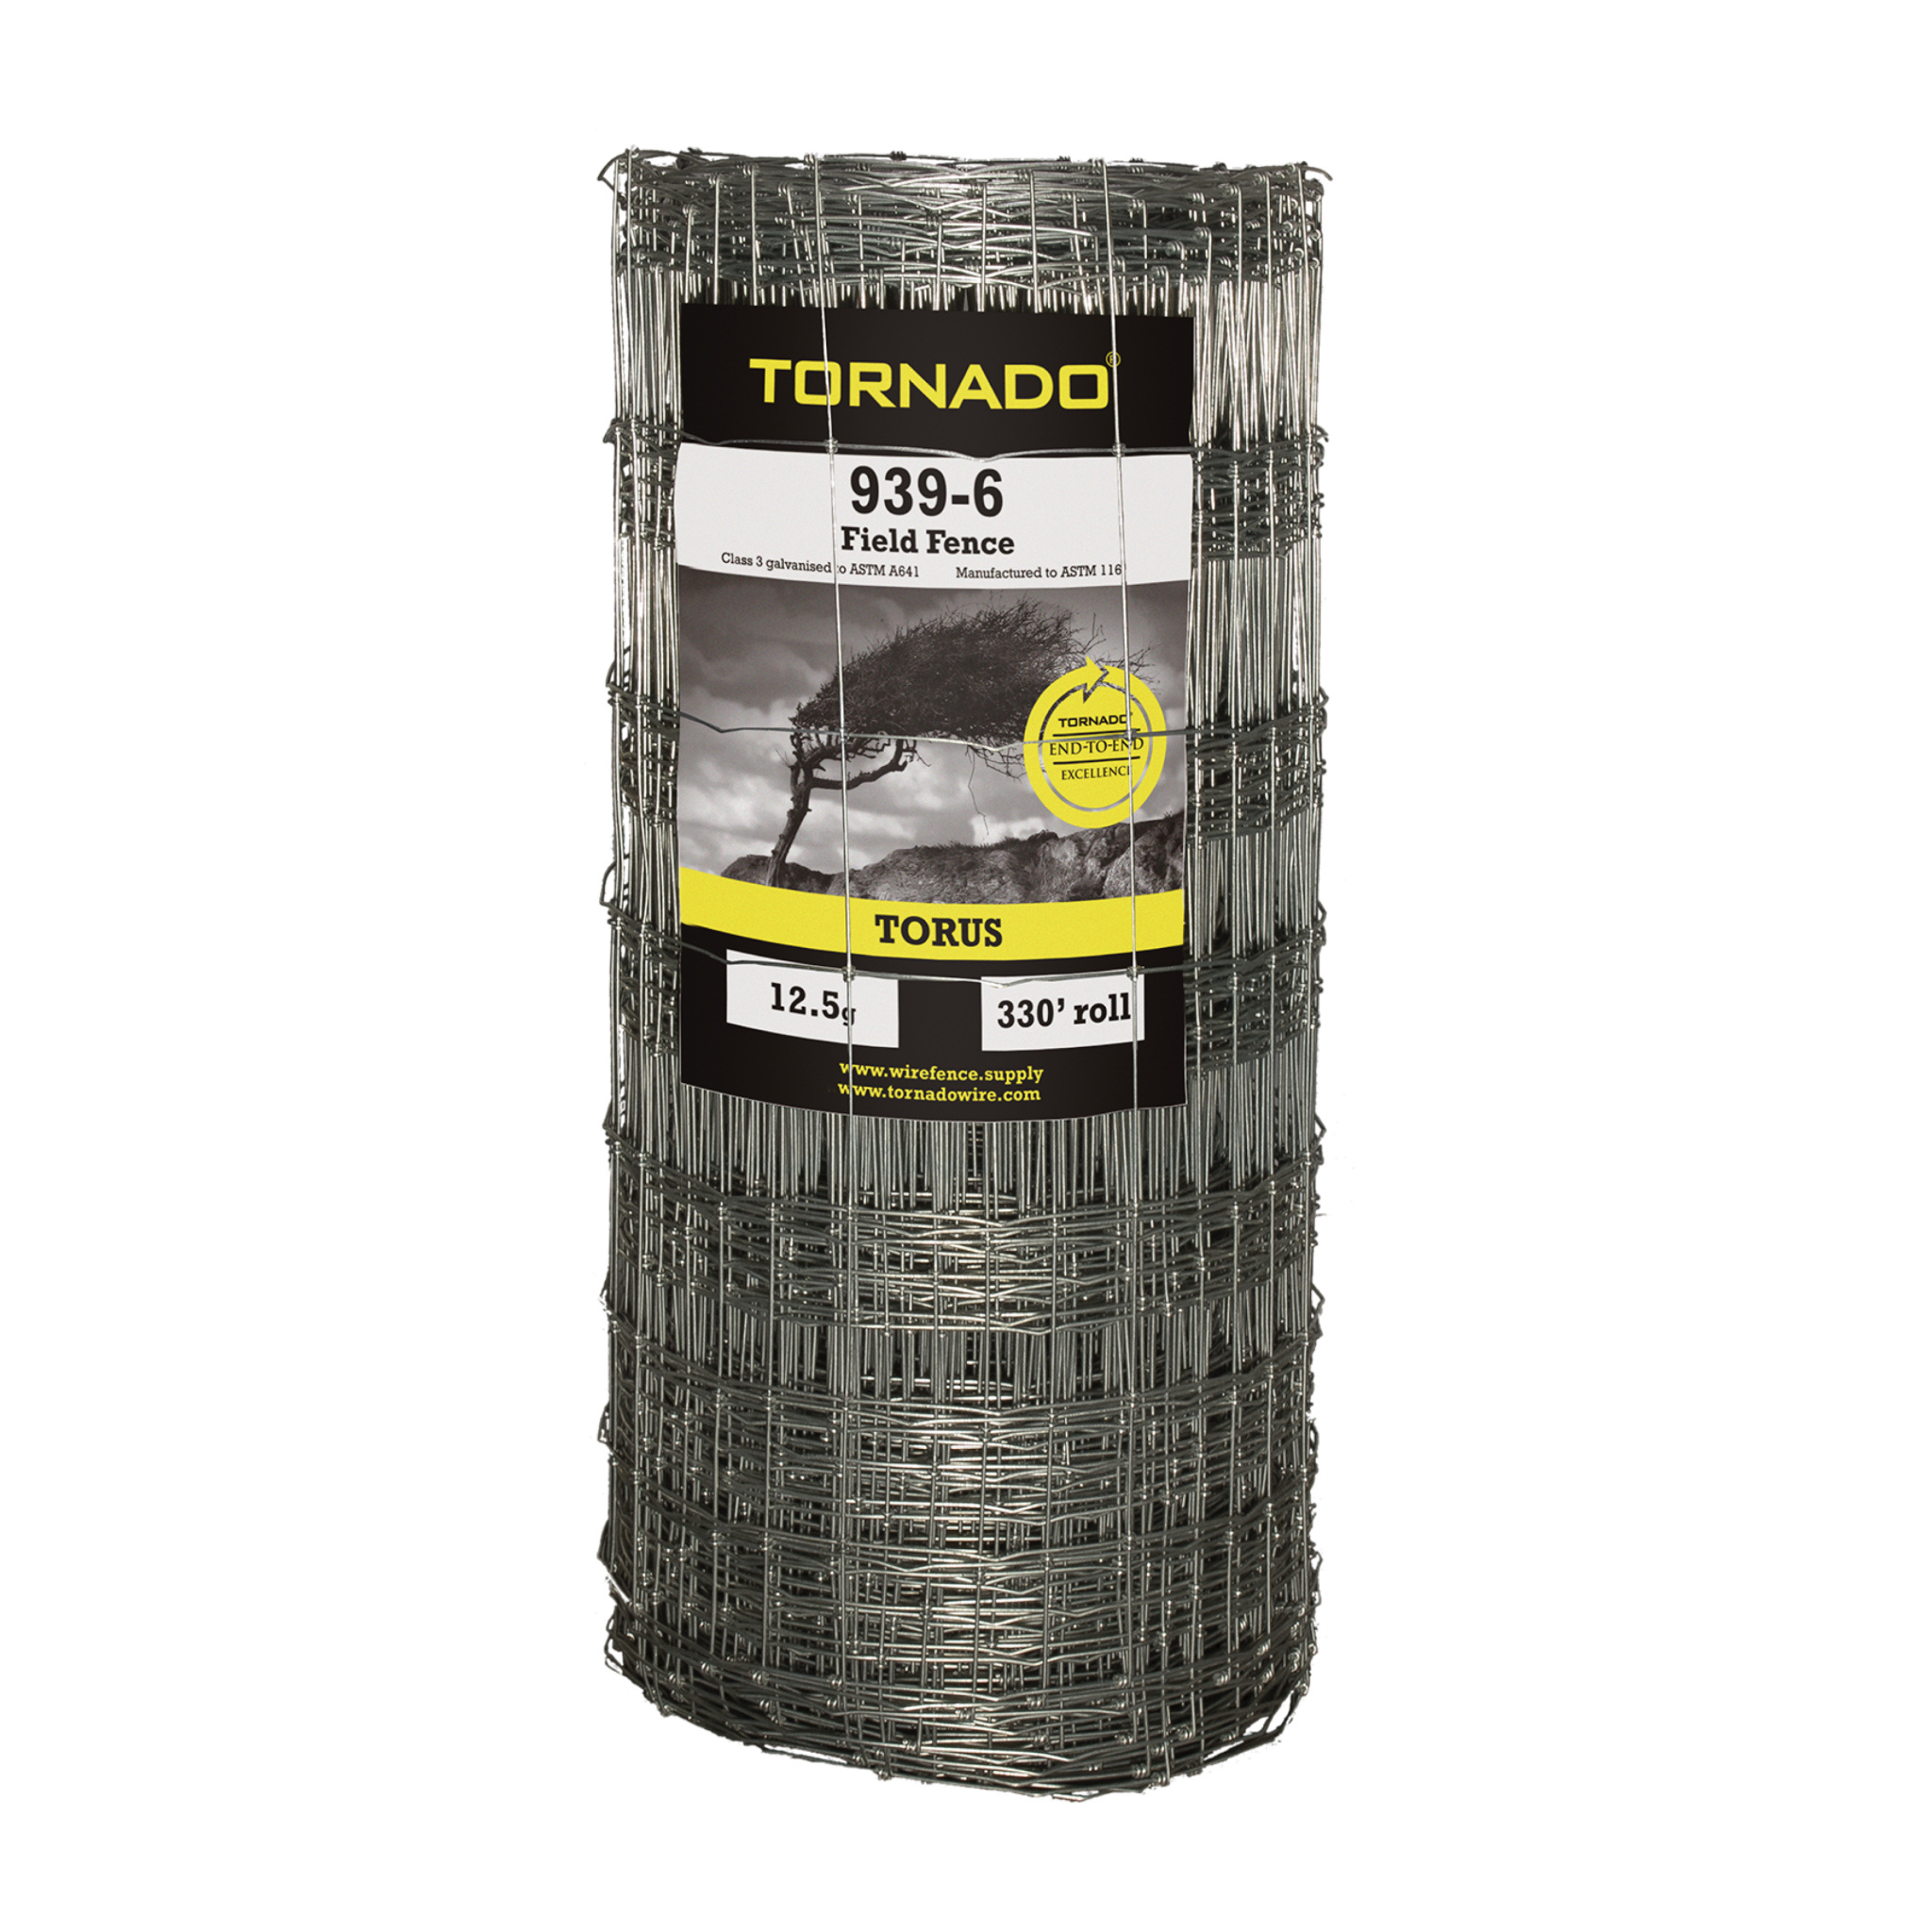 Tornado Wire 939 TORUS SQUARE KNOT HI TENSILE FENCE